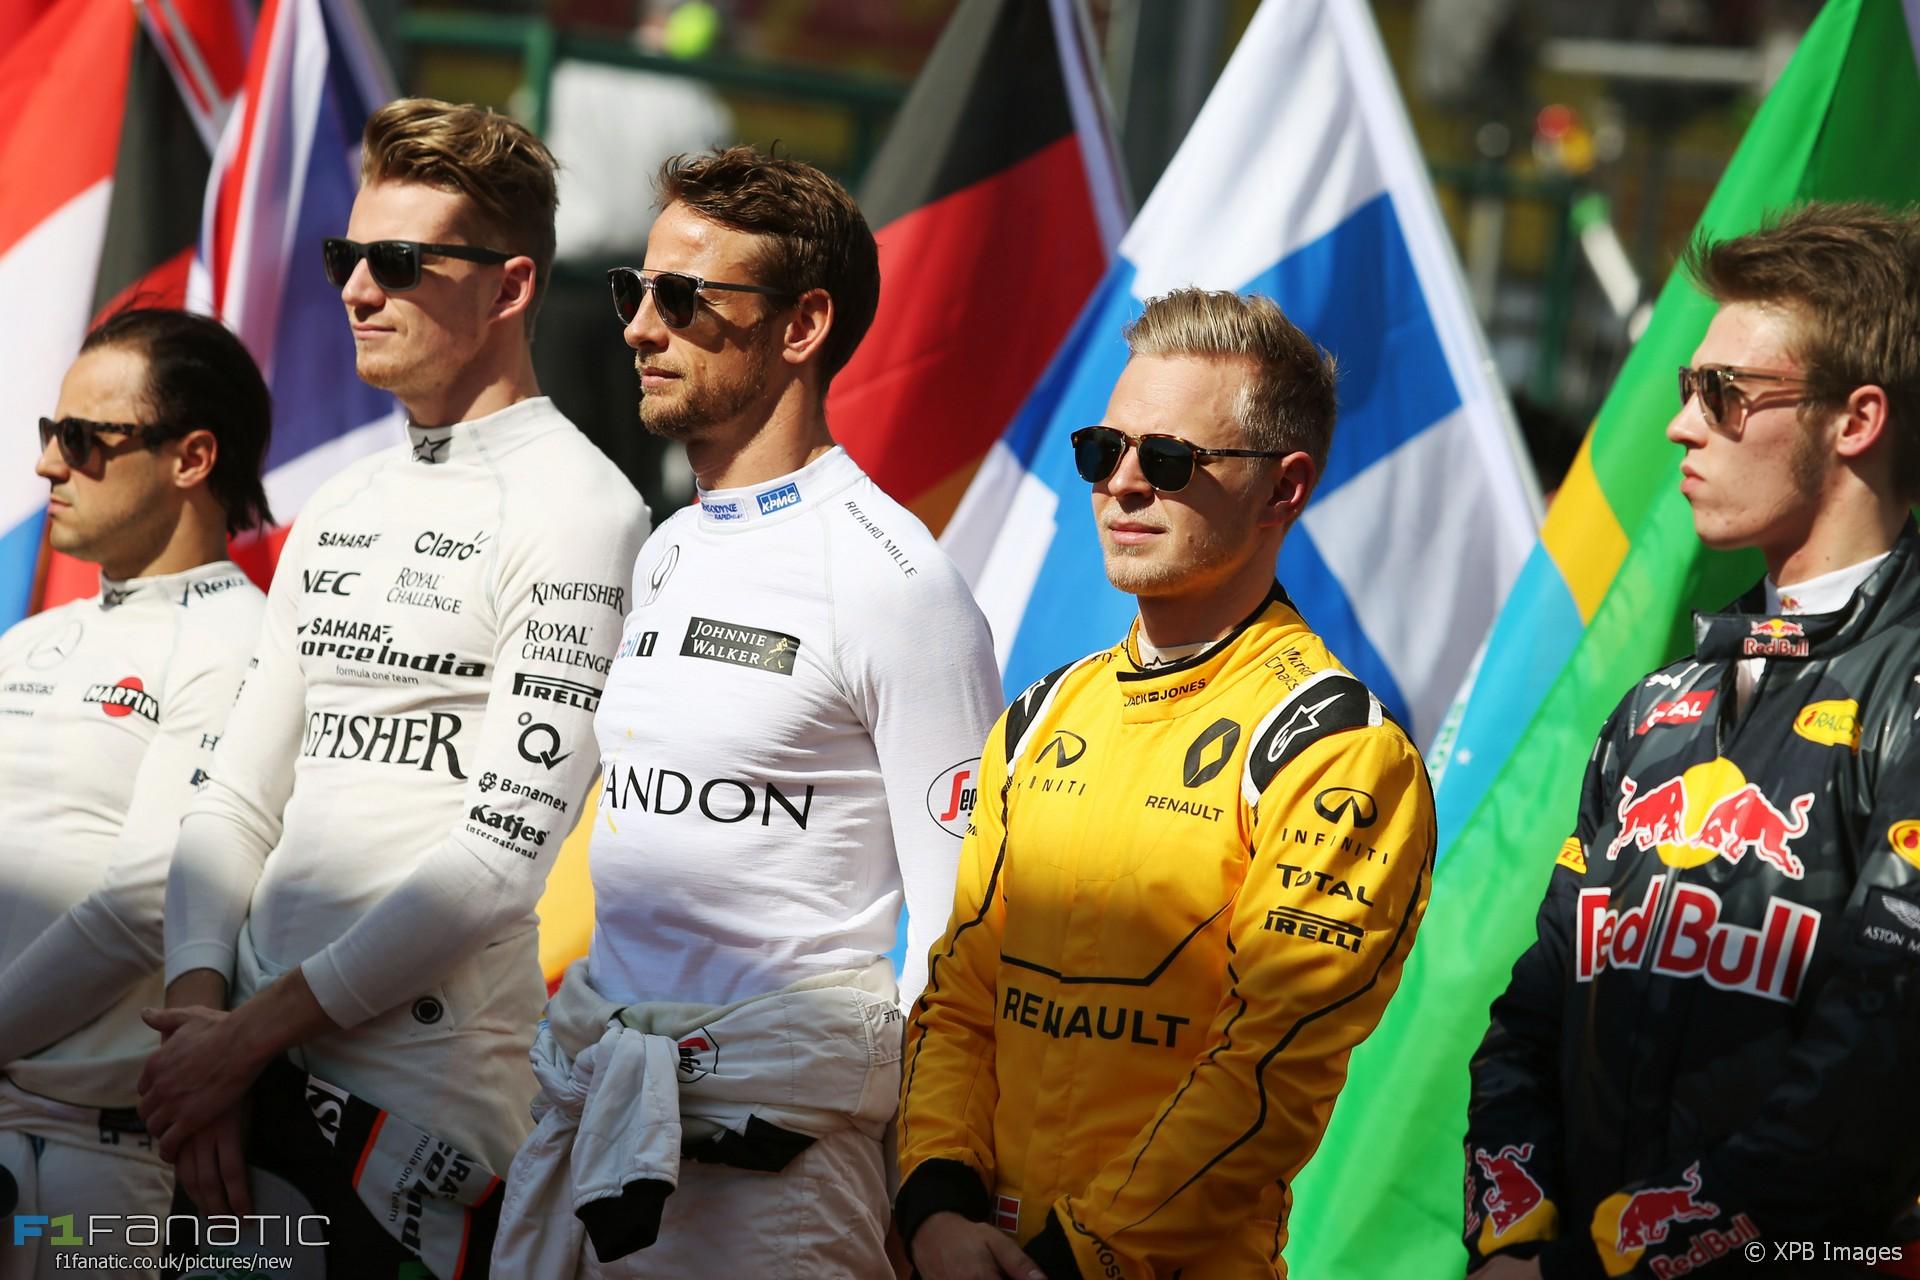 Felipe Massa, Nico Hulkenberg, Jenson Button, Kevin Magnussen, Daniil Kvyat, Albert Park, 2016